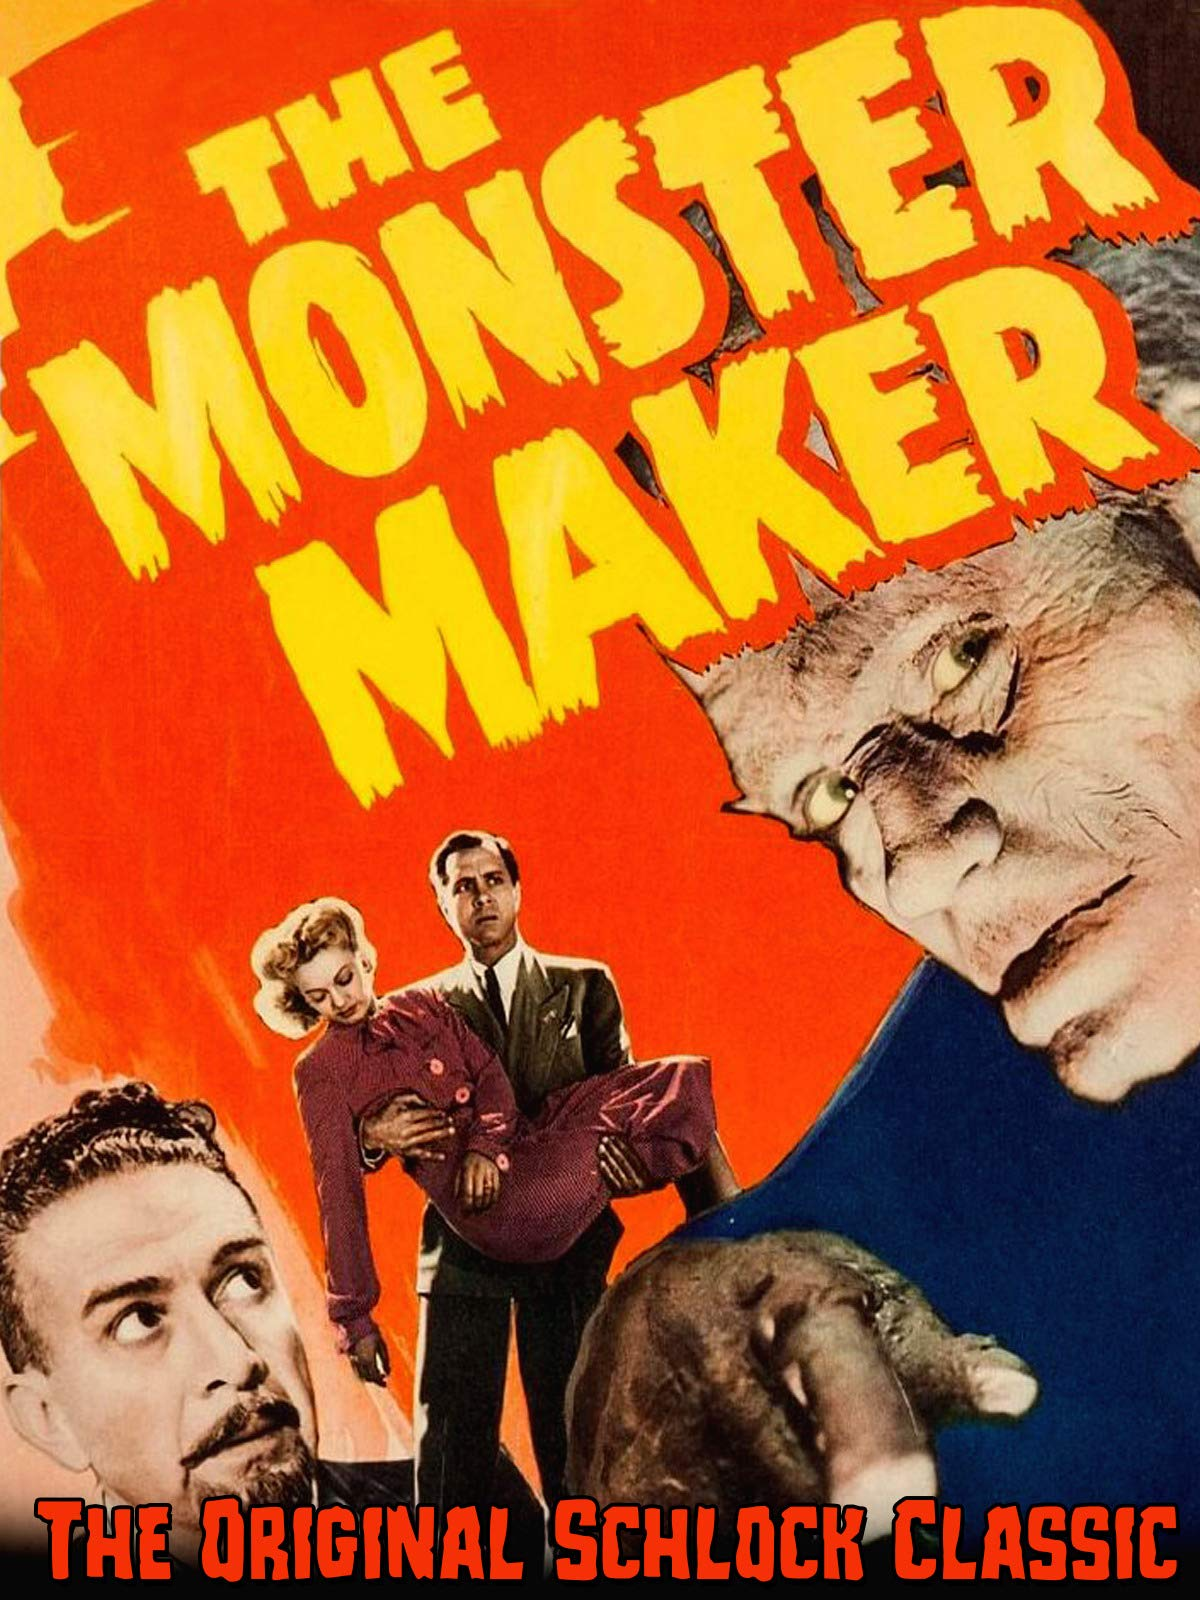 The Monster Maker - The Original Schlock Classic